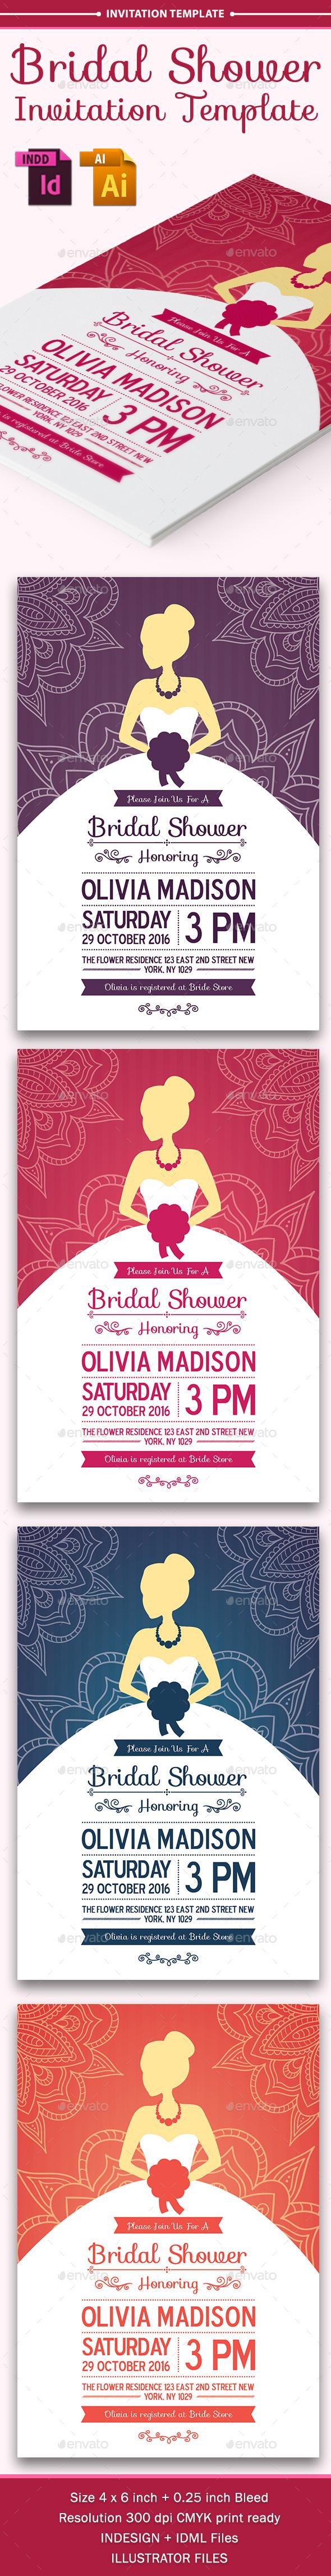 Bridal Shower Invitation Template - Cards & Invites Print Templates